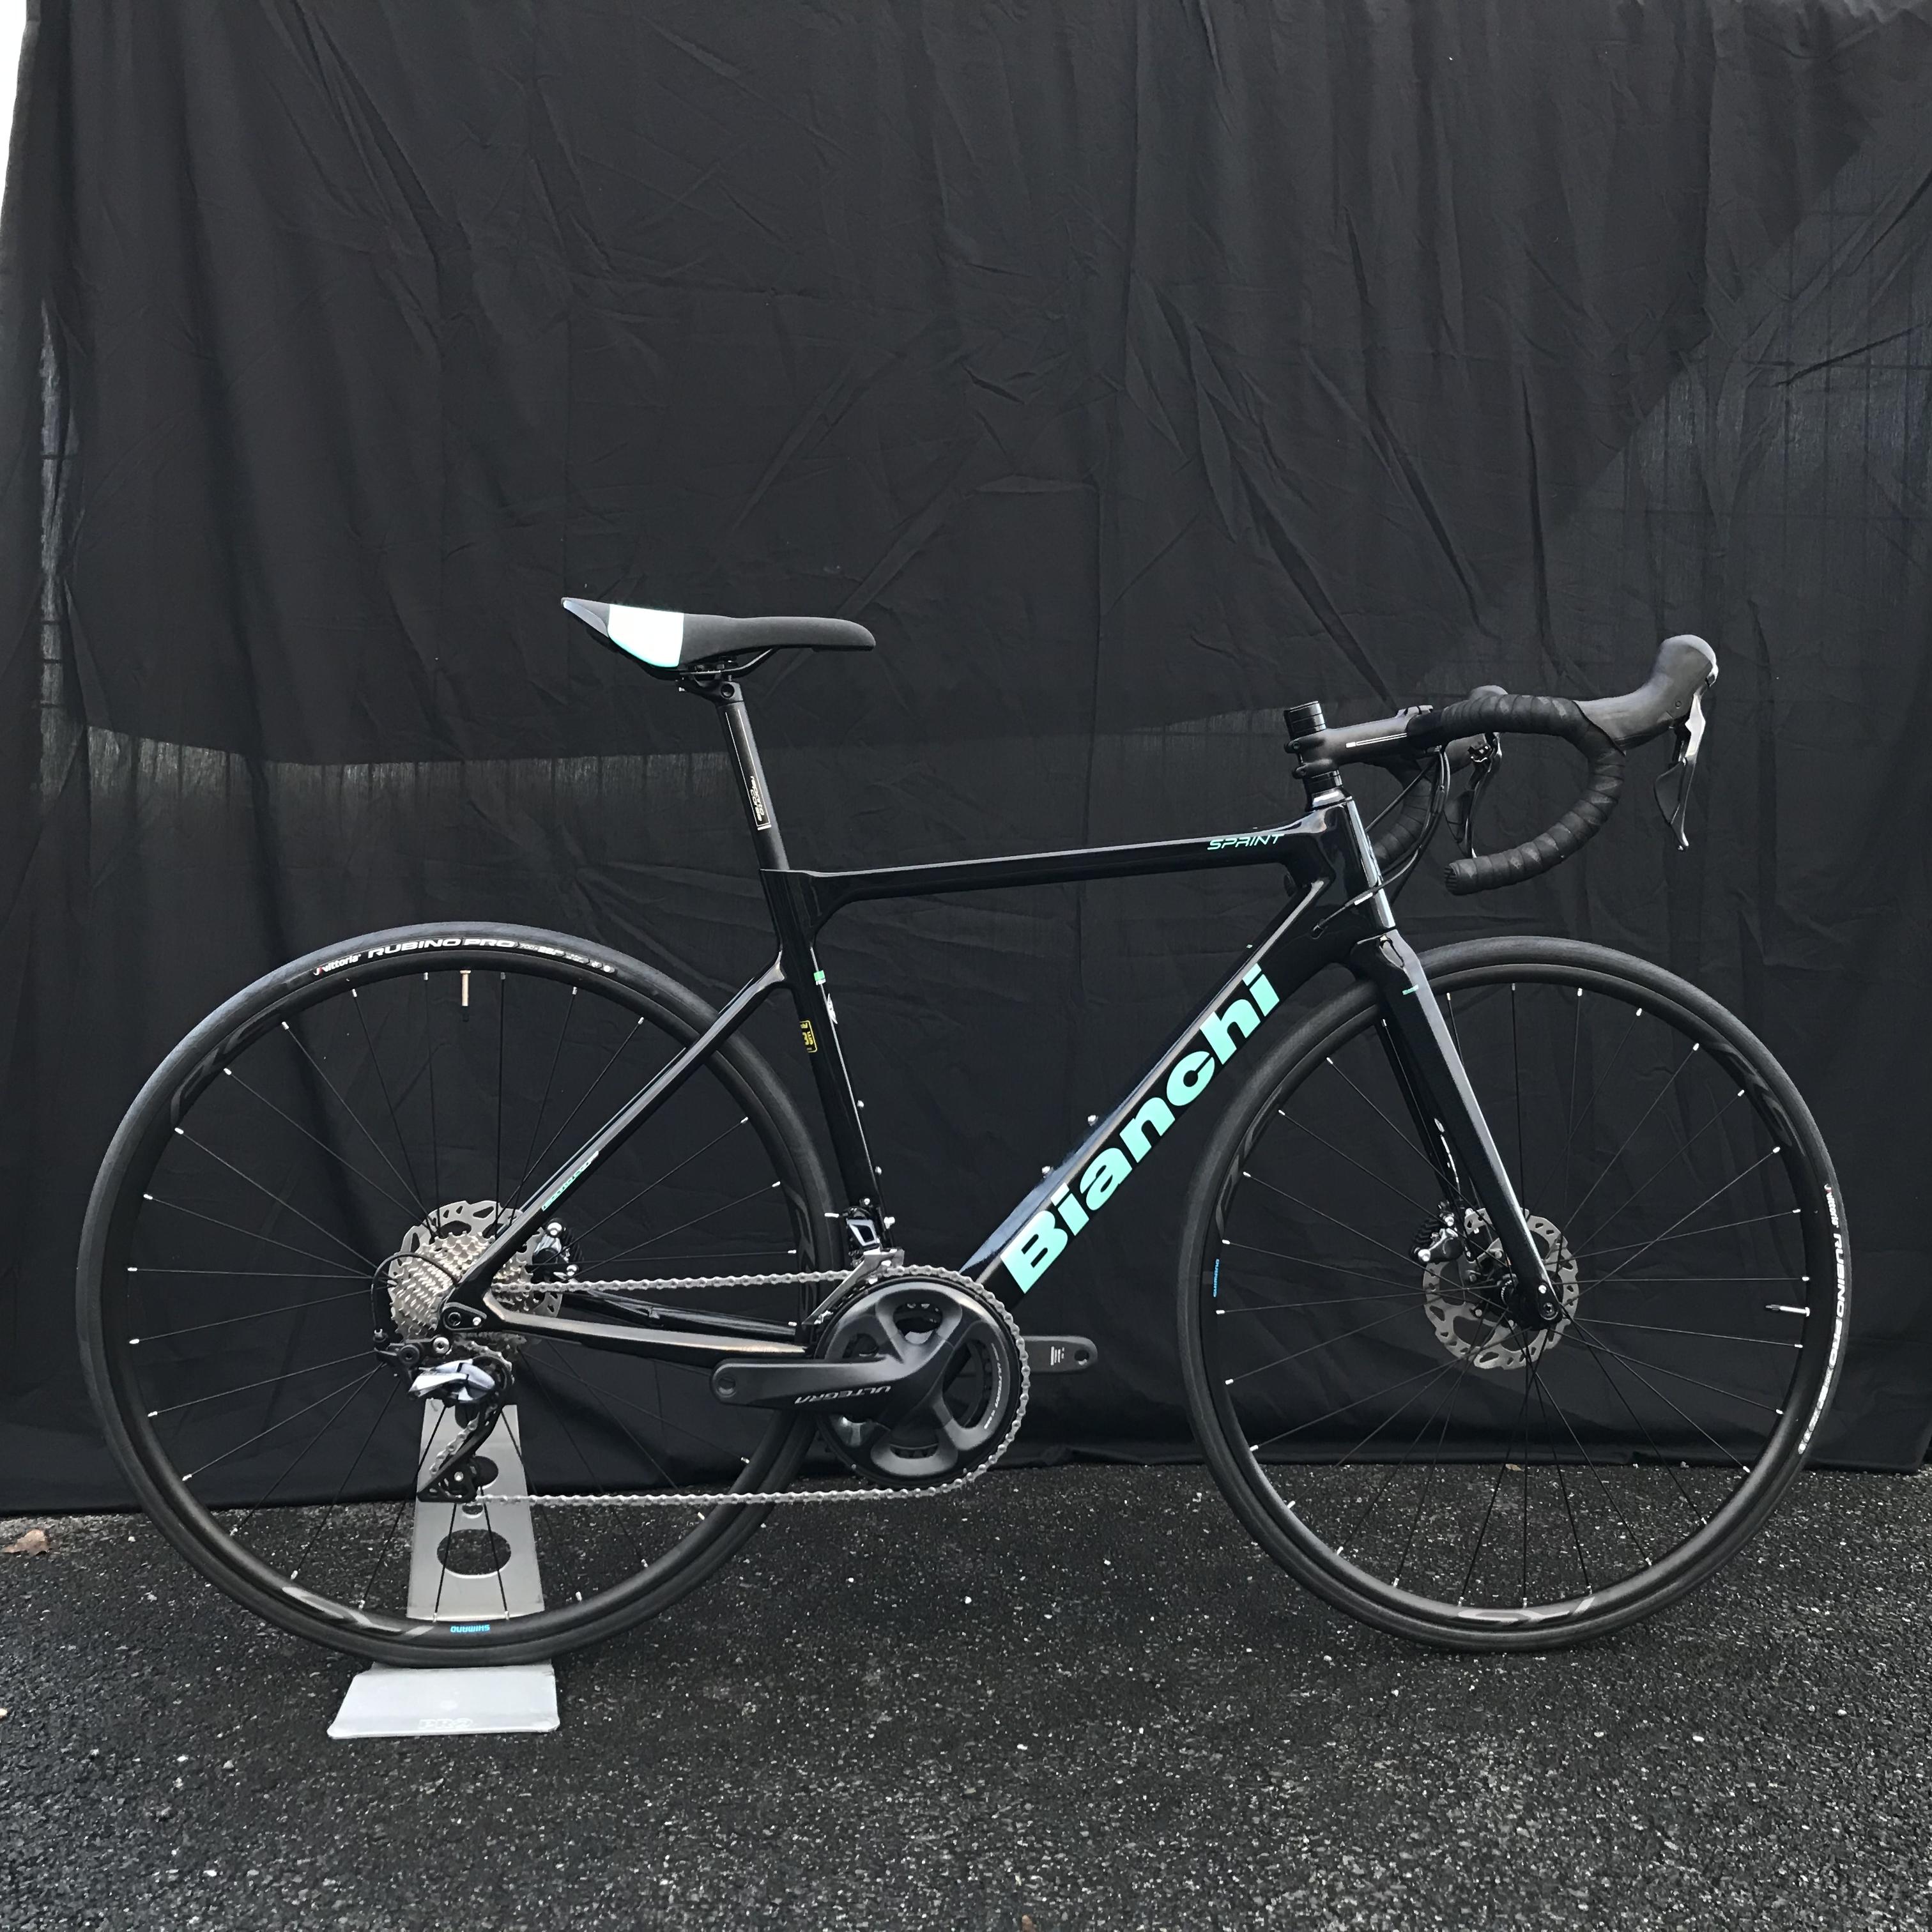 Bianchi Sprint disc